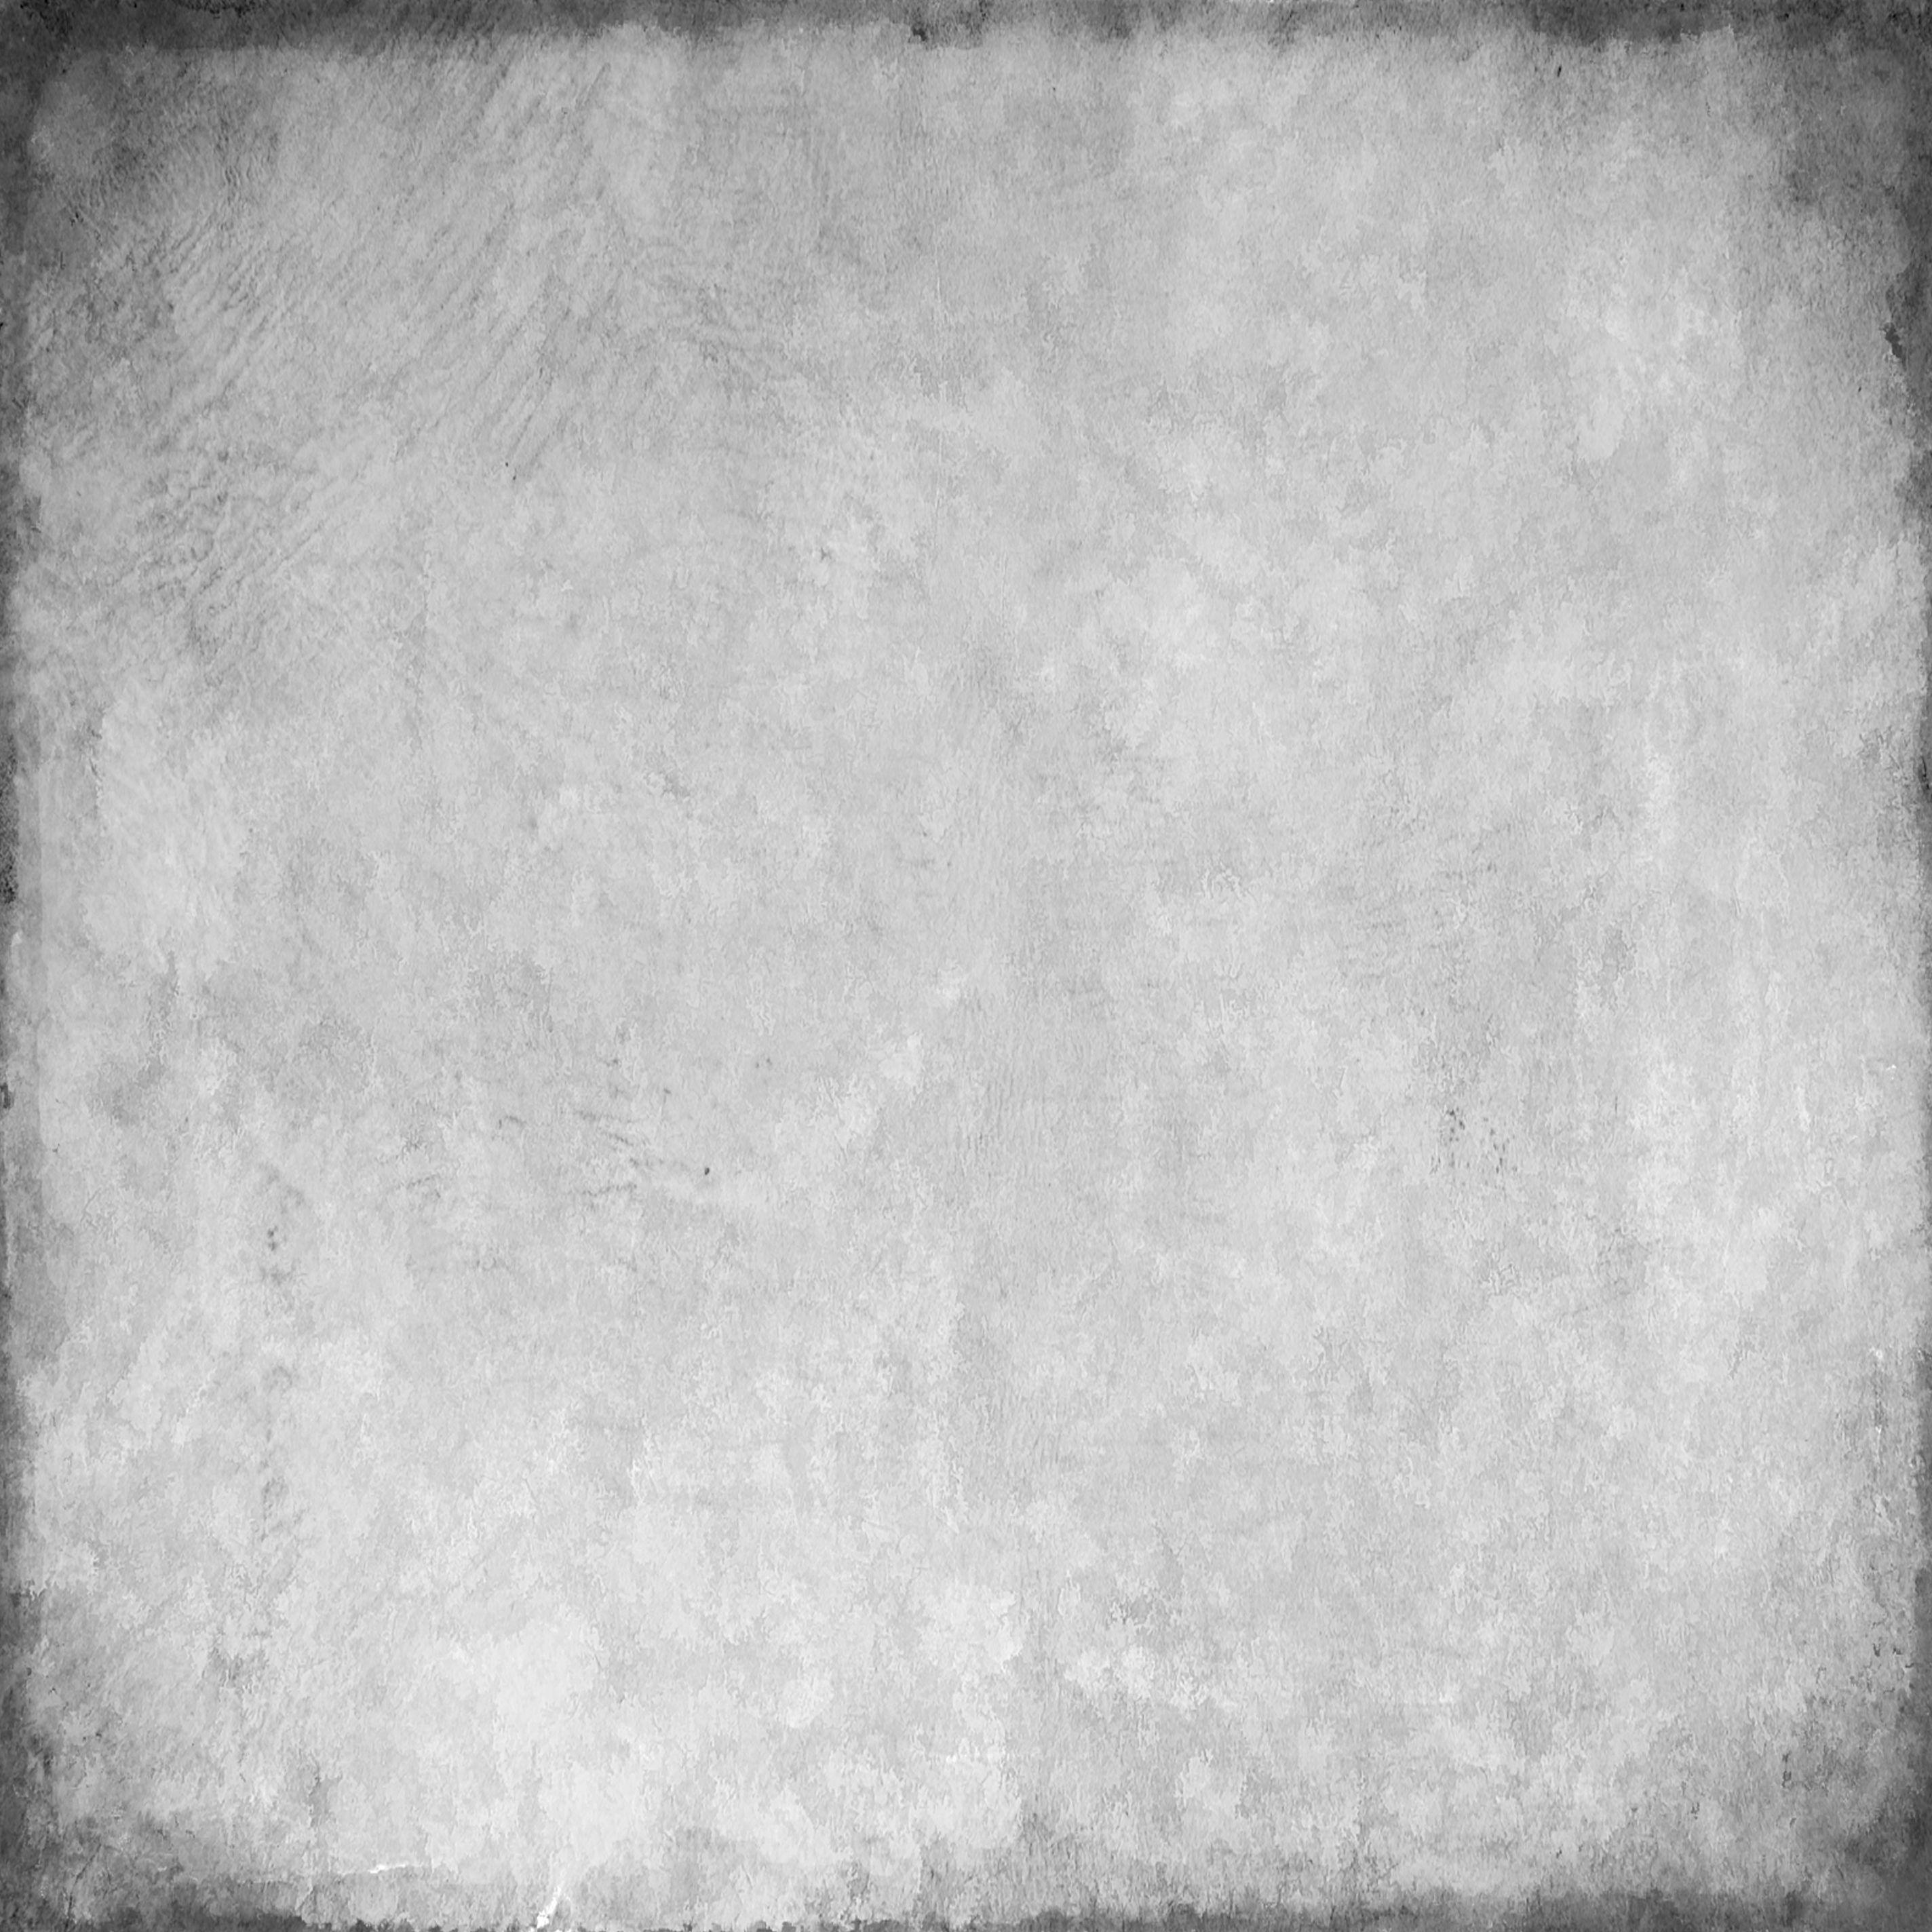 grey-worn-leather-texture.jpg (2848×2848)   texture   Pinterest